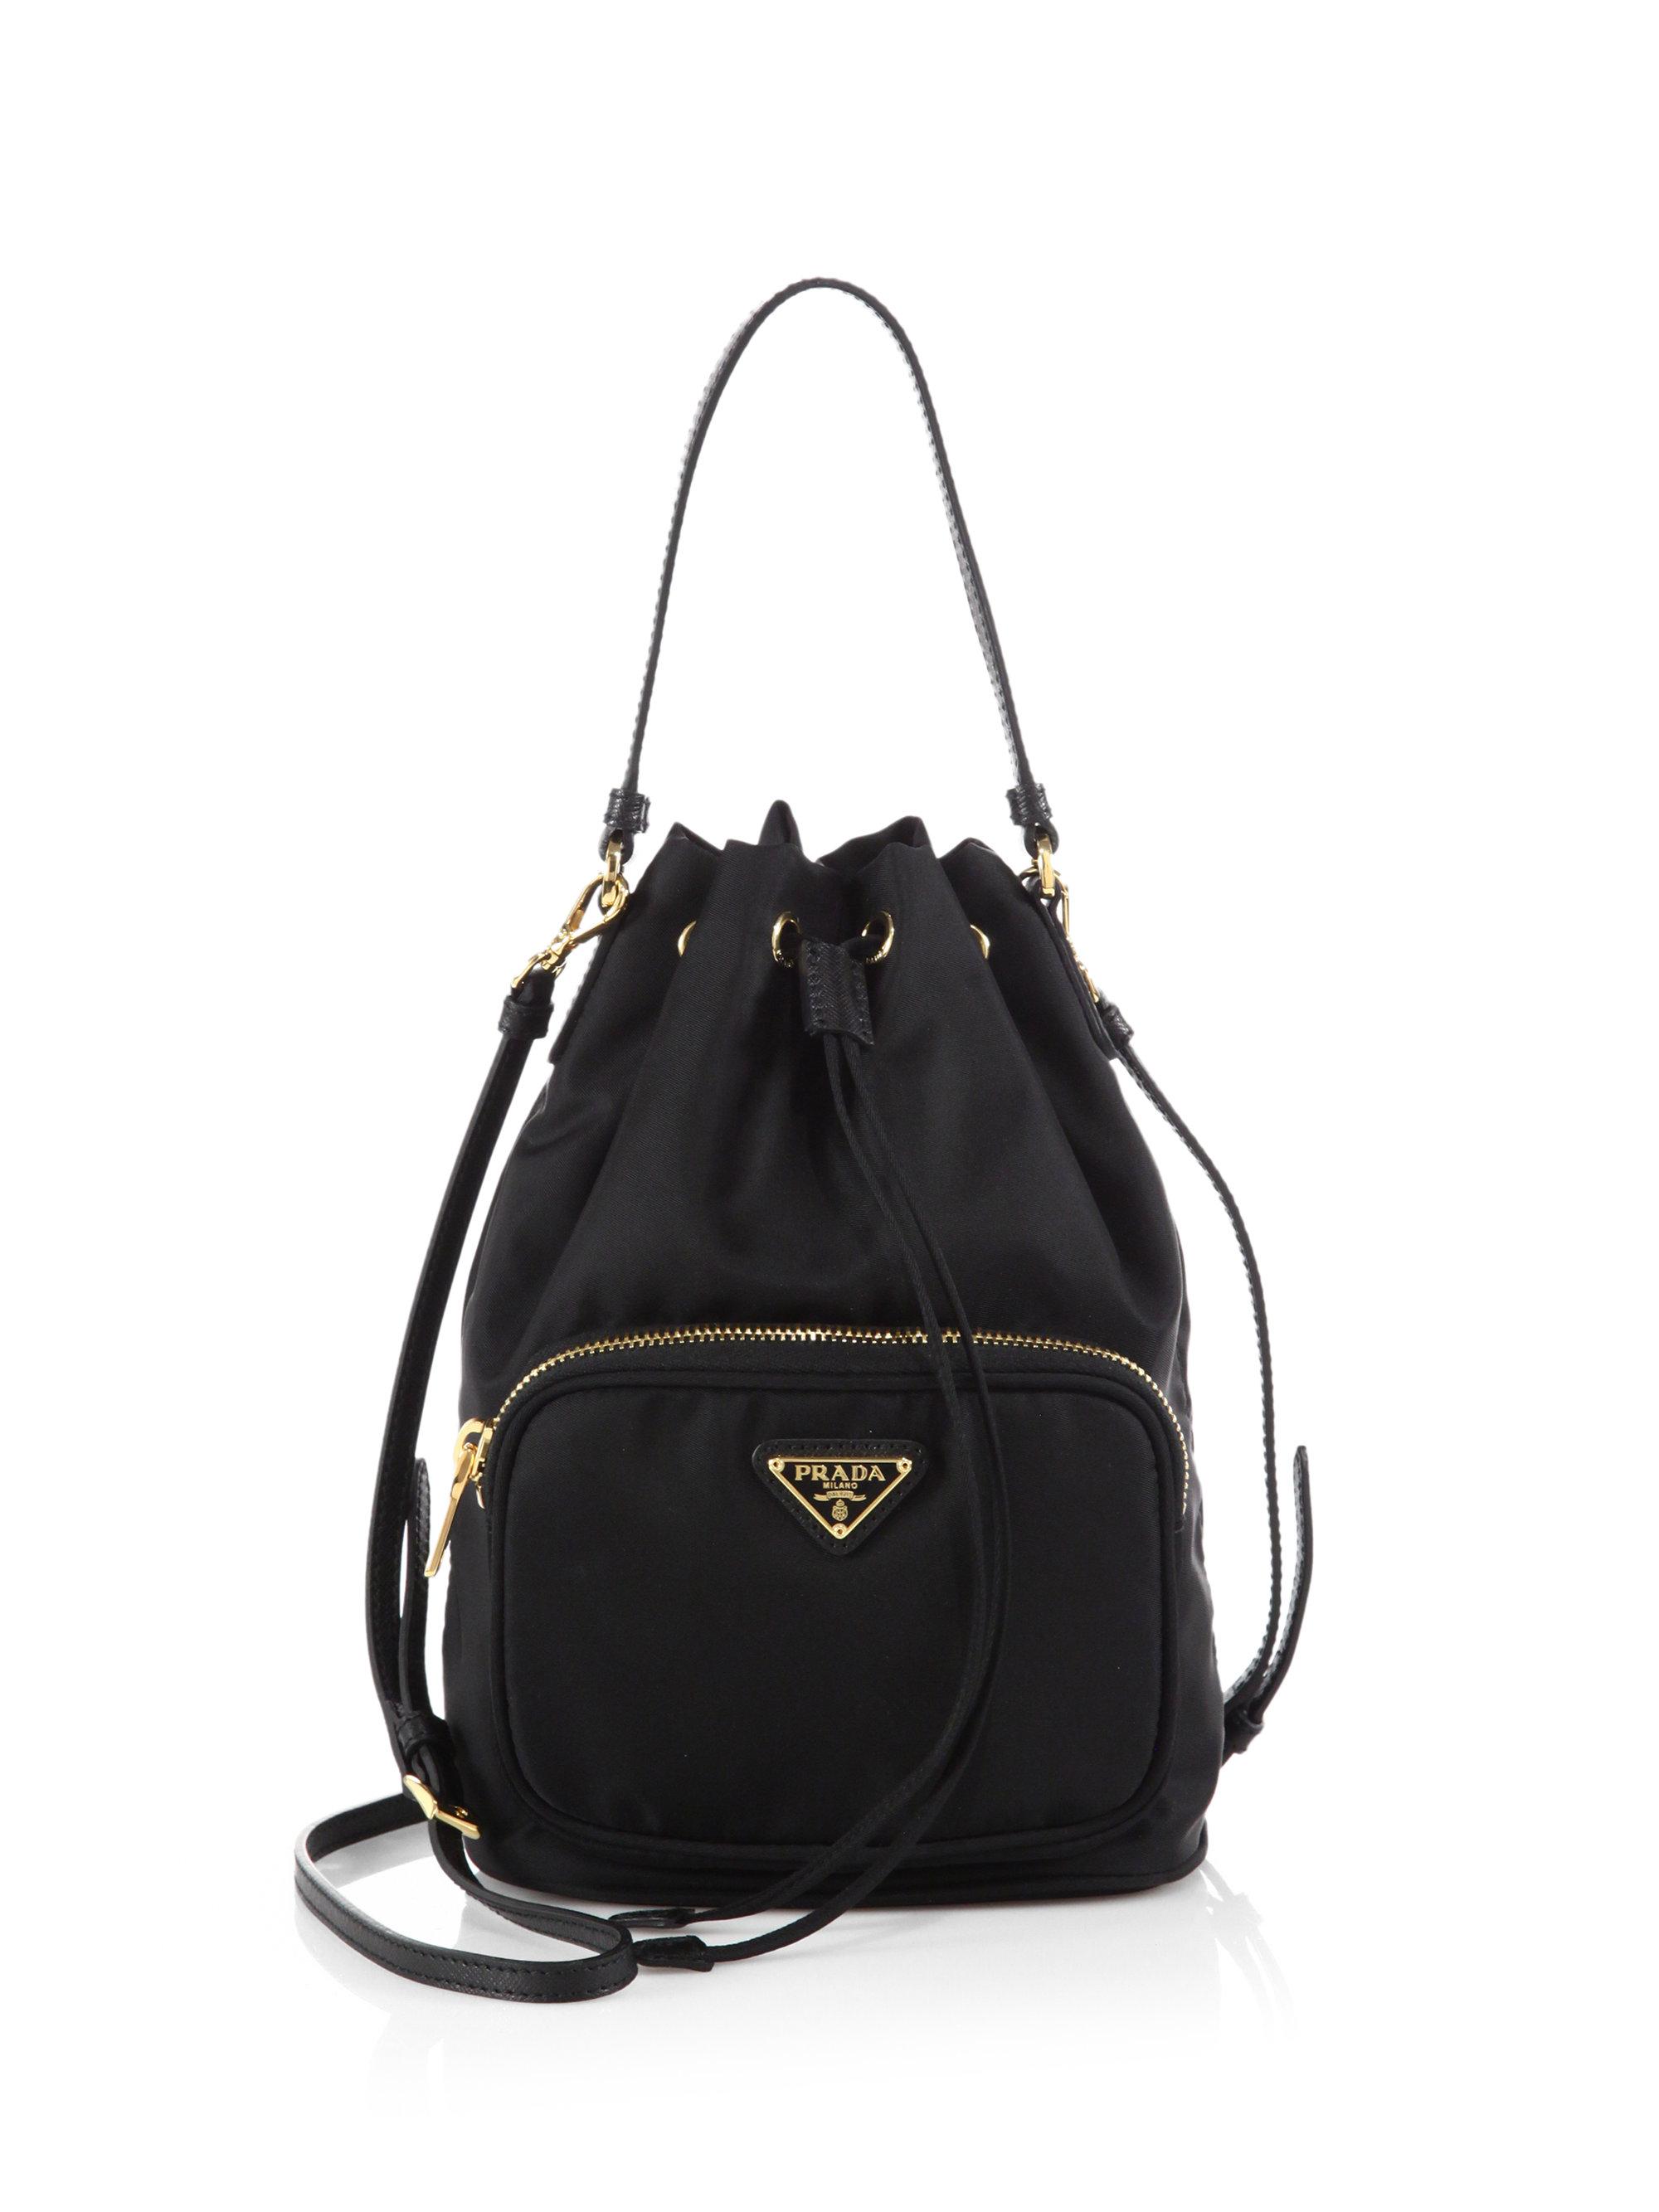 Prada Tess Drawstring Nylon Pouch Crossbody Bag In Black